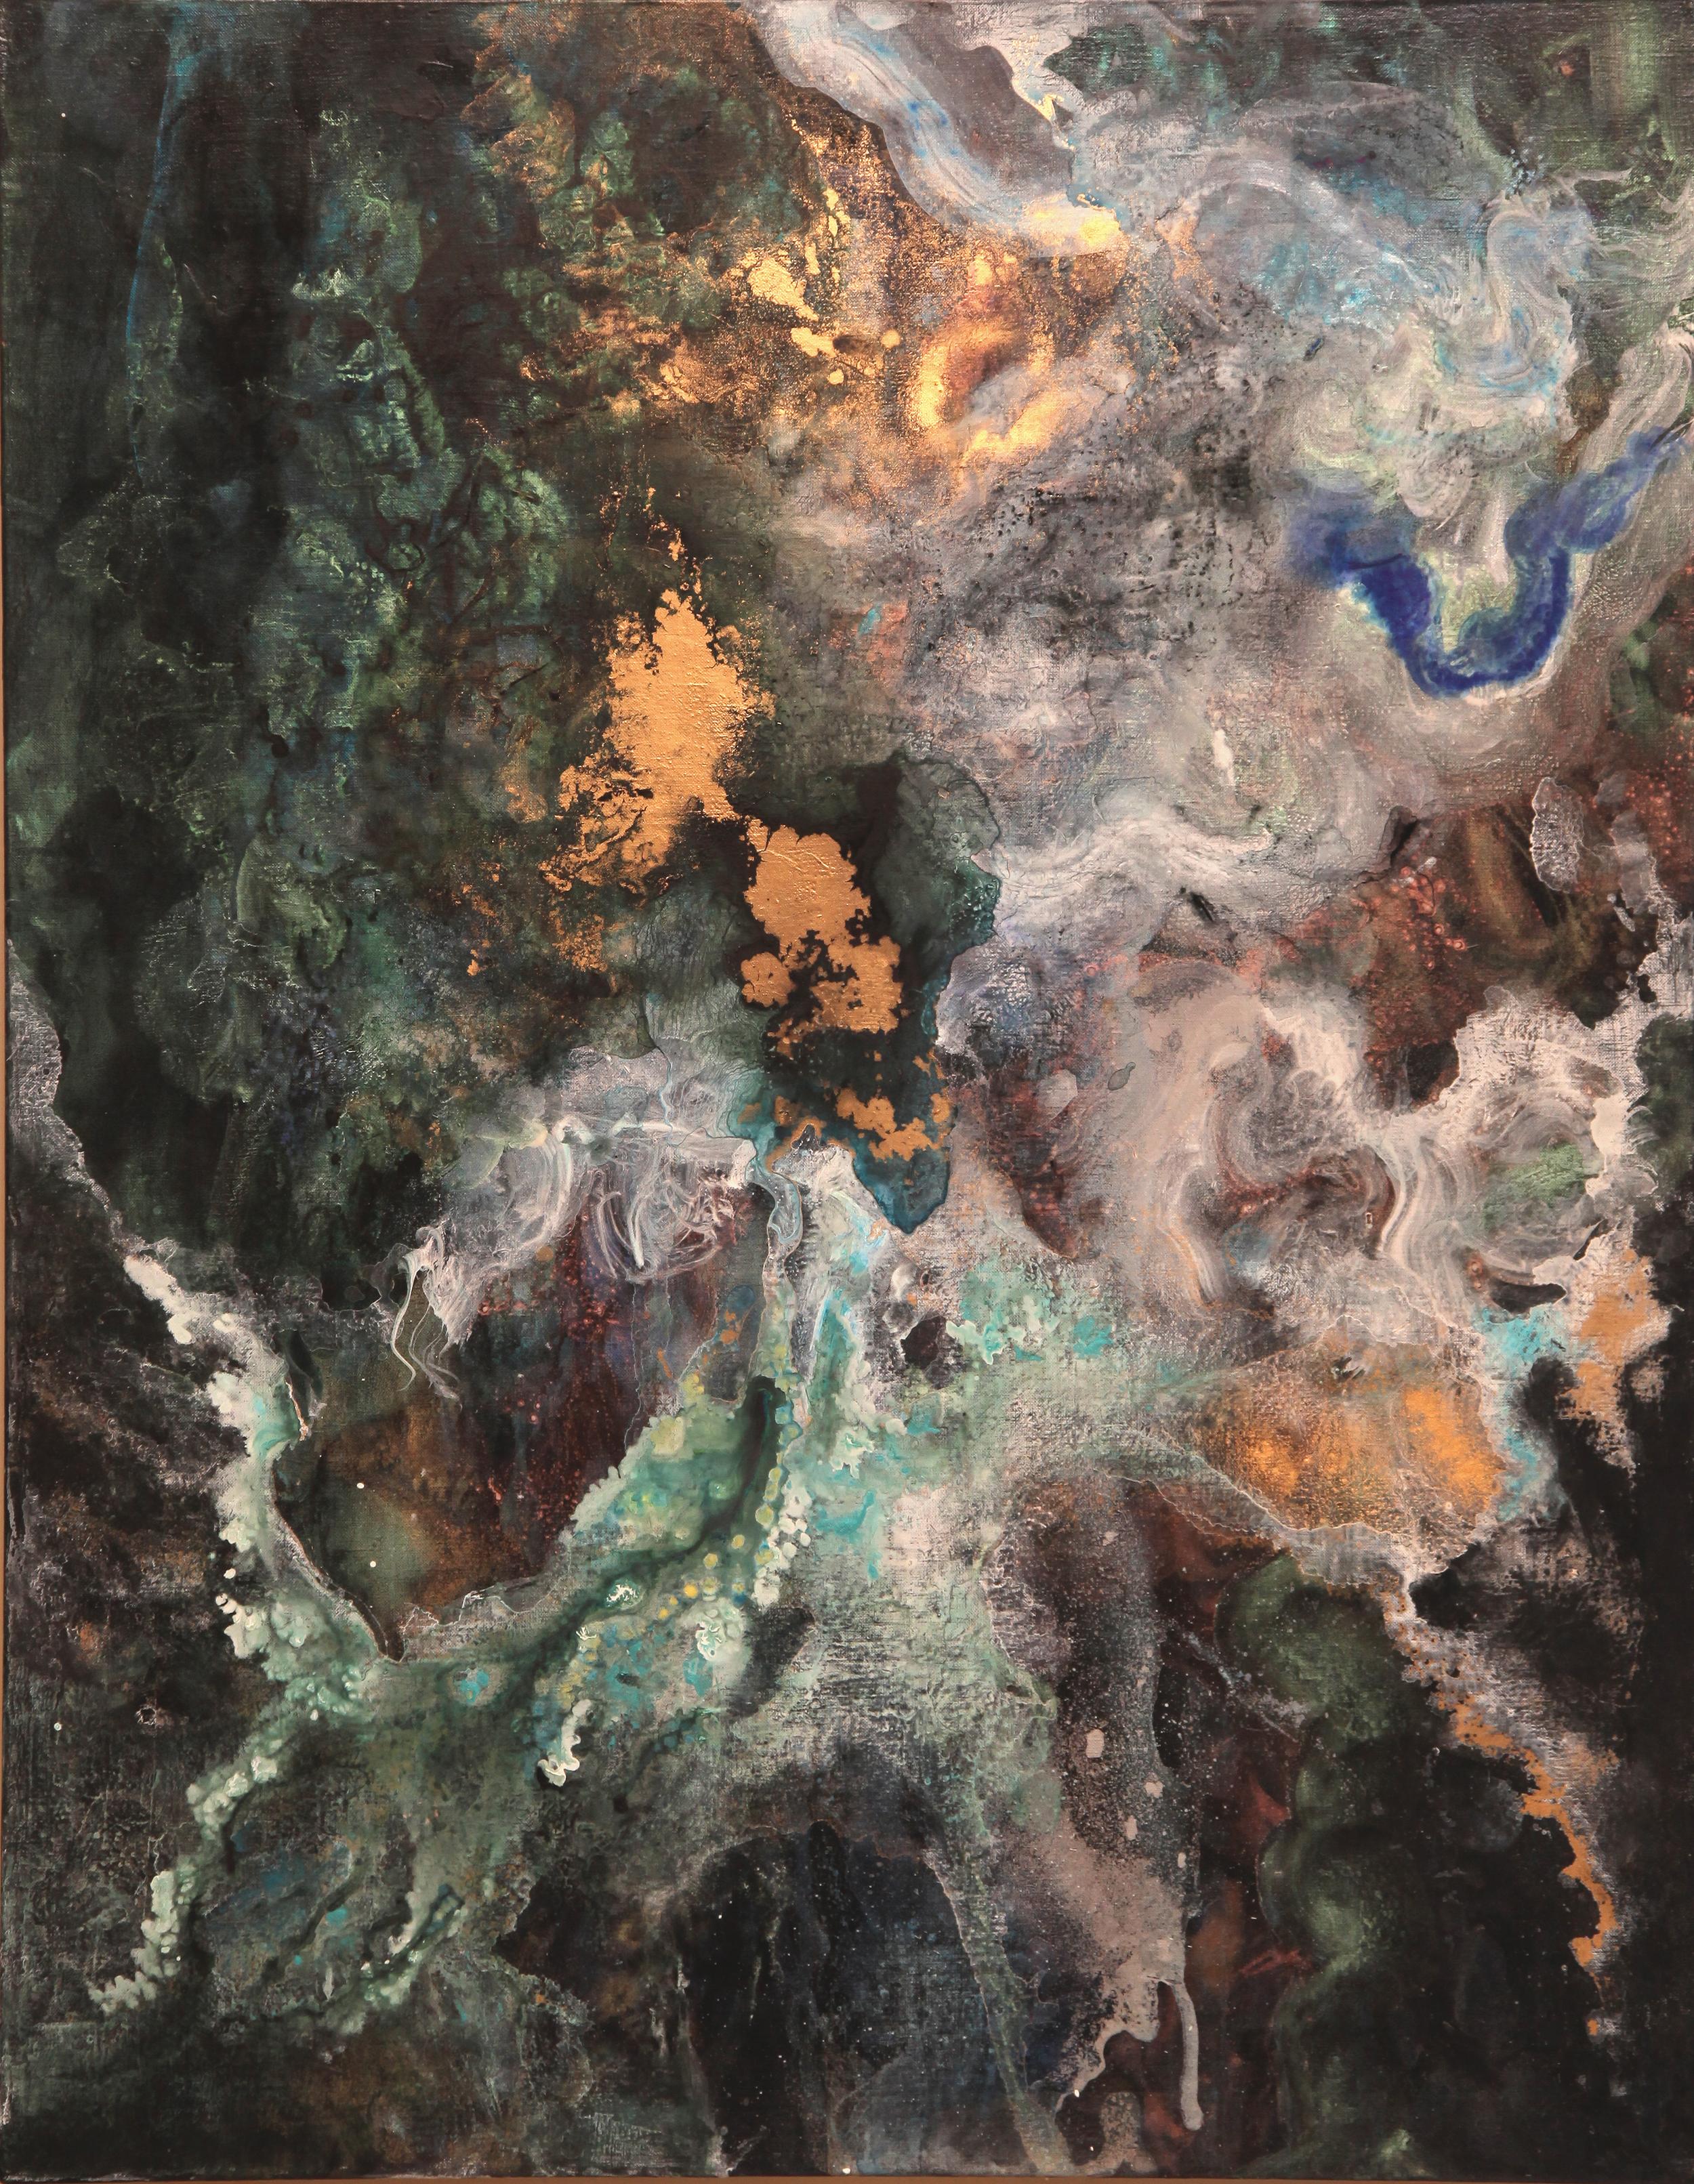 garden  2014  Acrylic and metal powder on canvas  H117cm x W91cm